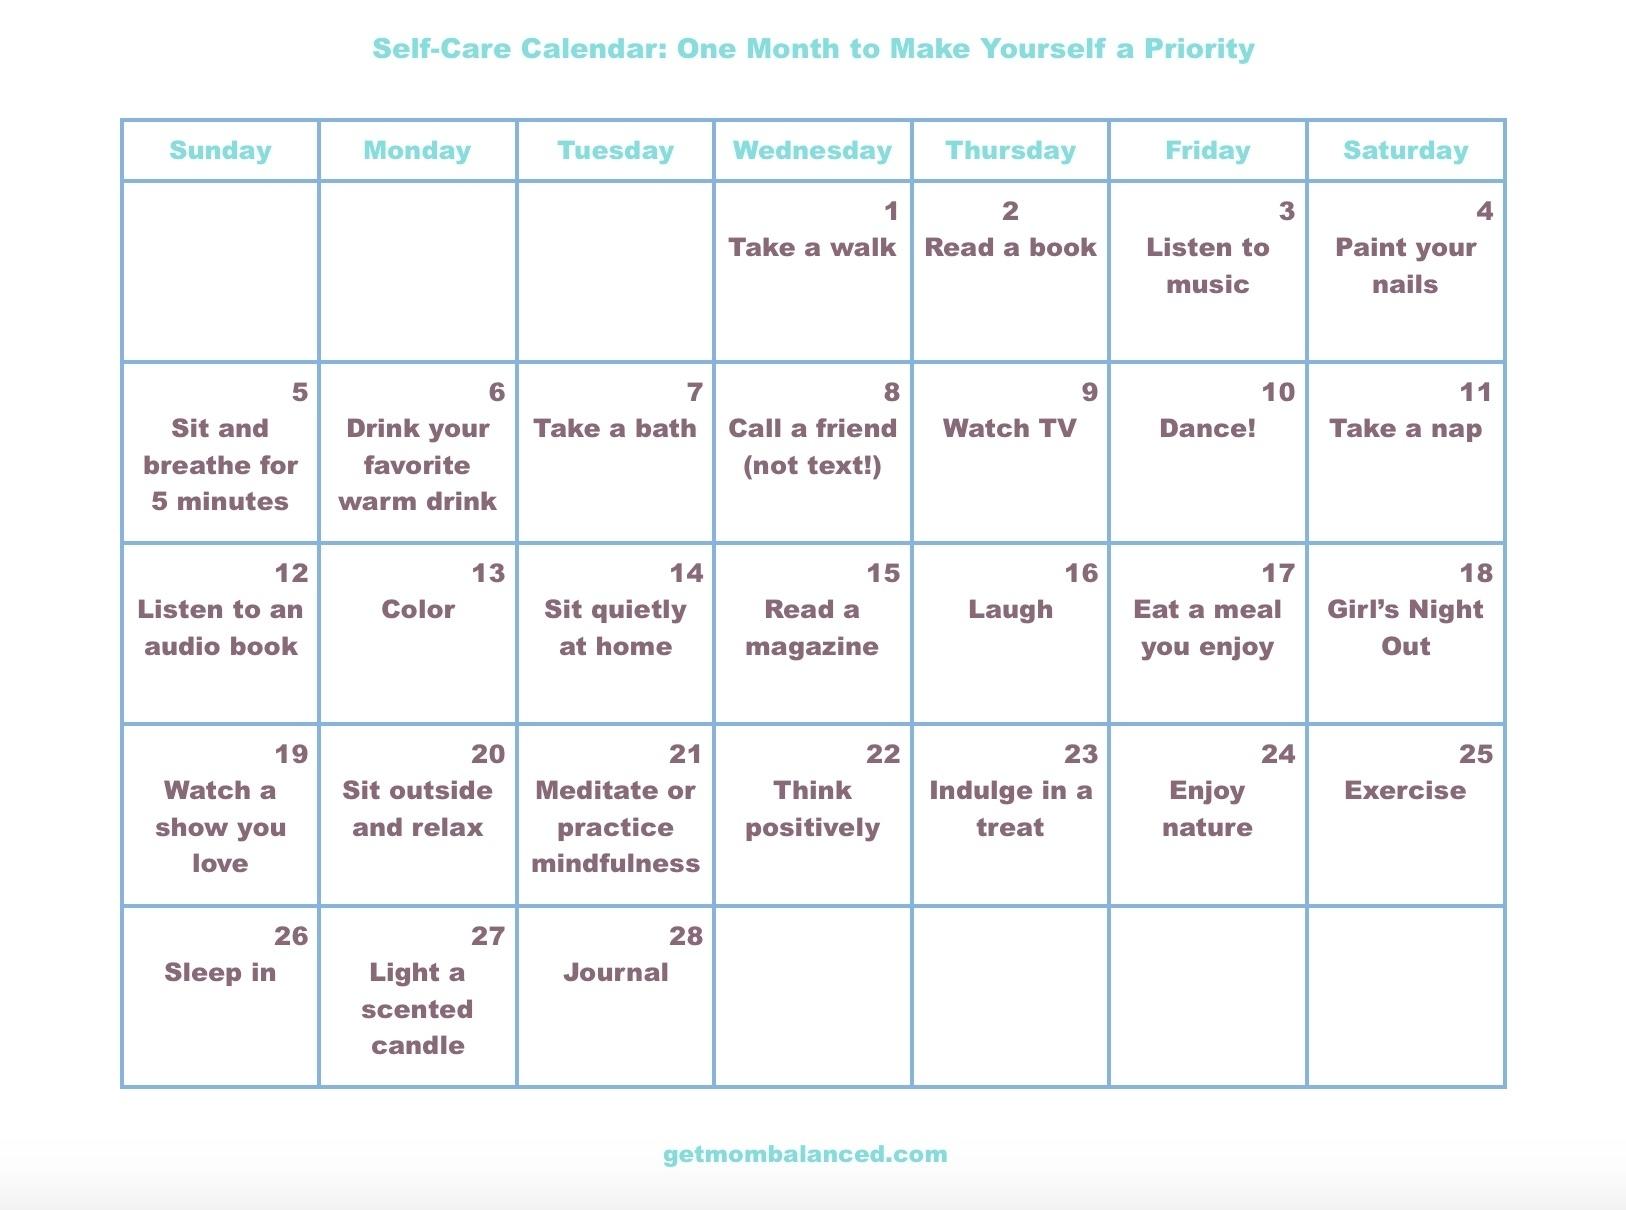 Self-Care Calendar For Busy Moms And Women - Get Mom Balanced